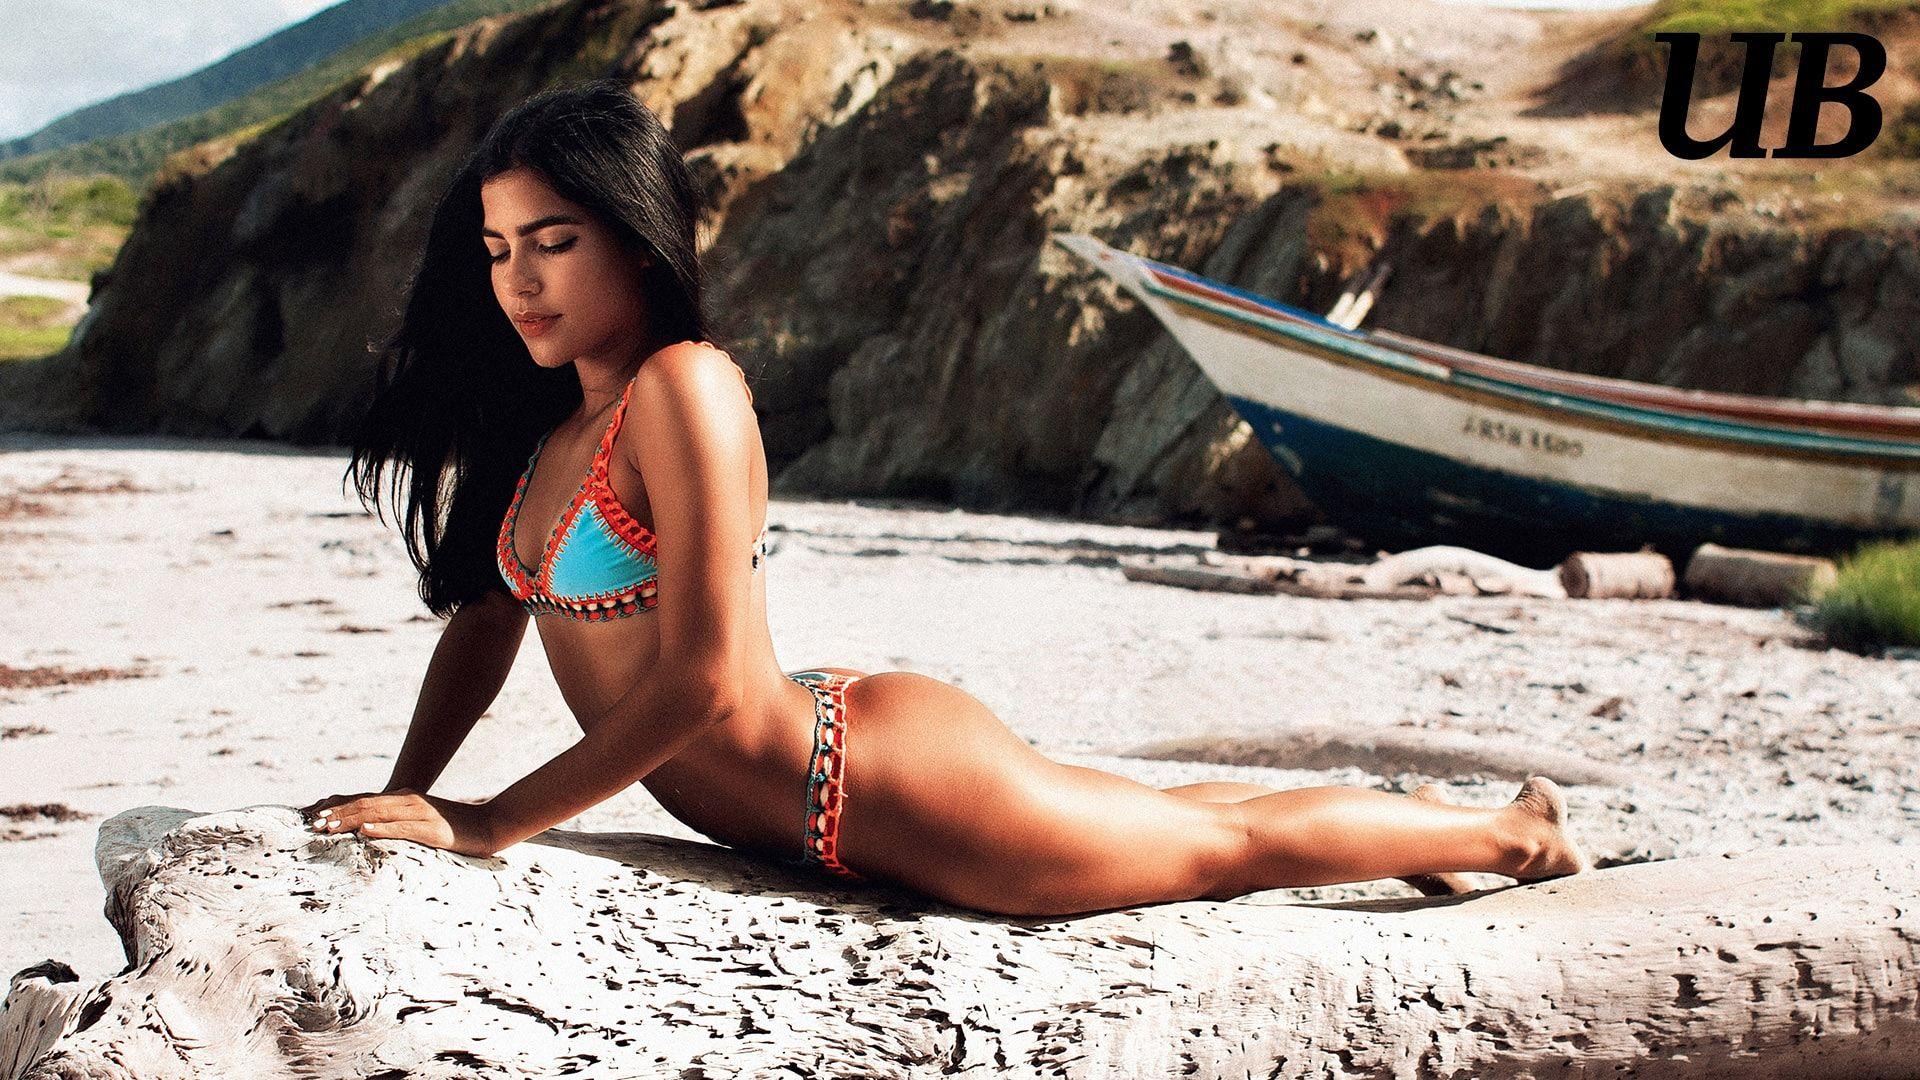 Valeria Jaime desde la perla del caribe